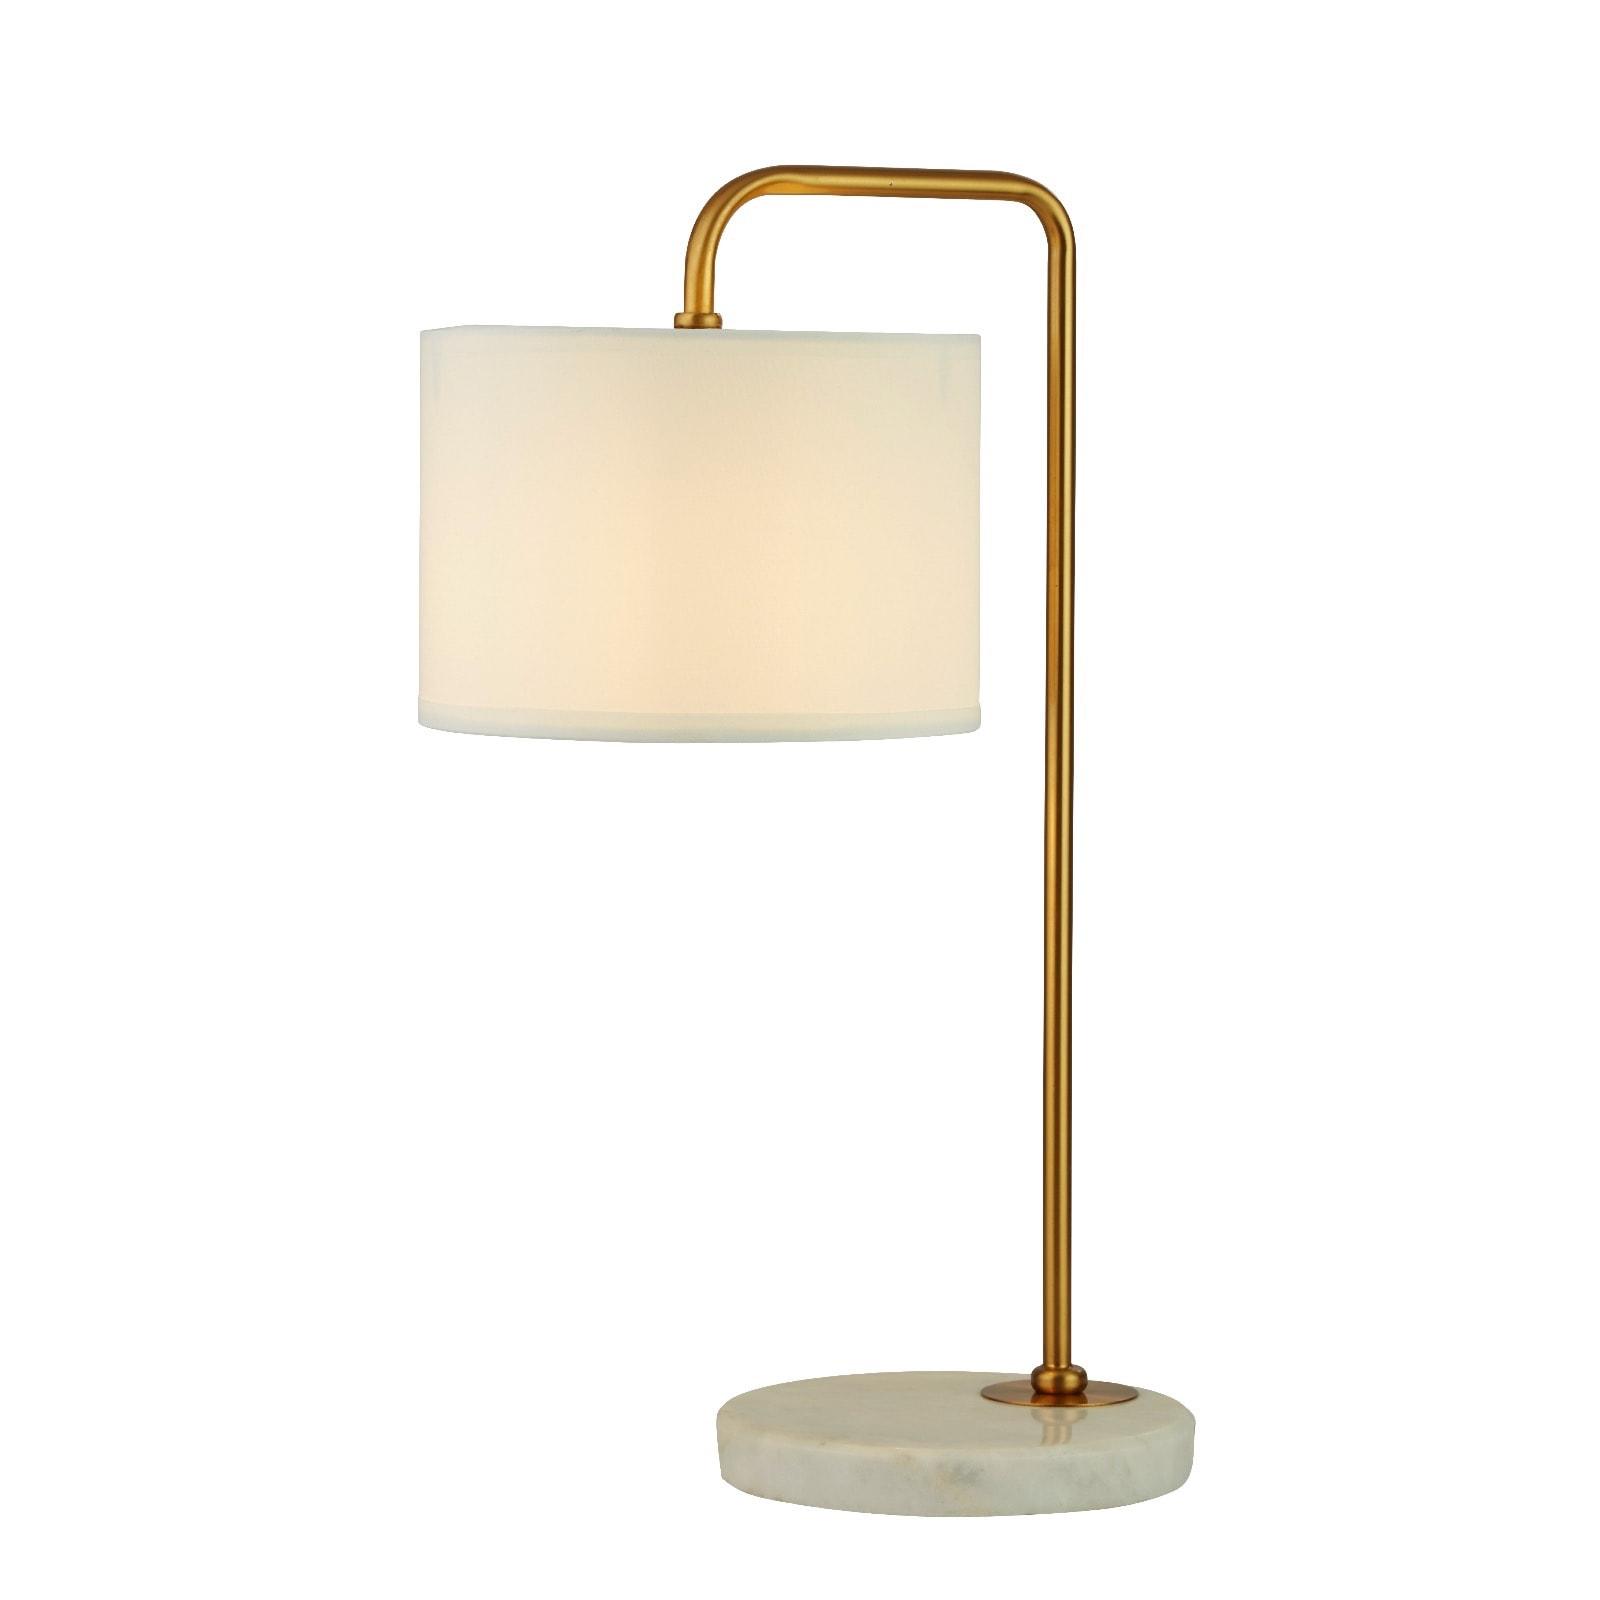 HANGMAN GOLD TABLE LAMP WITH WHITE MARBLE BASE - Ledlam ...